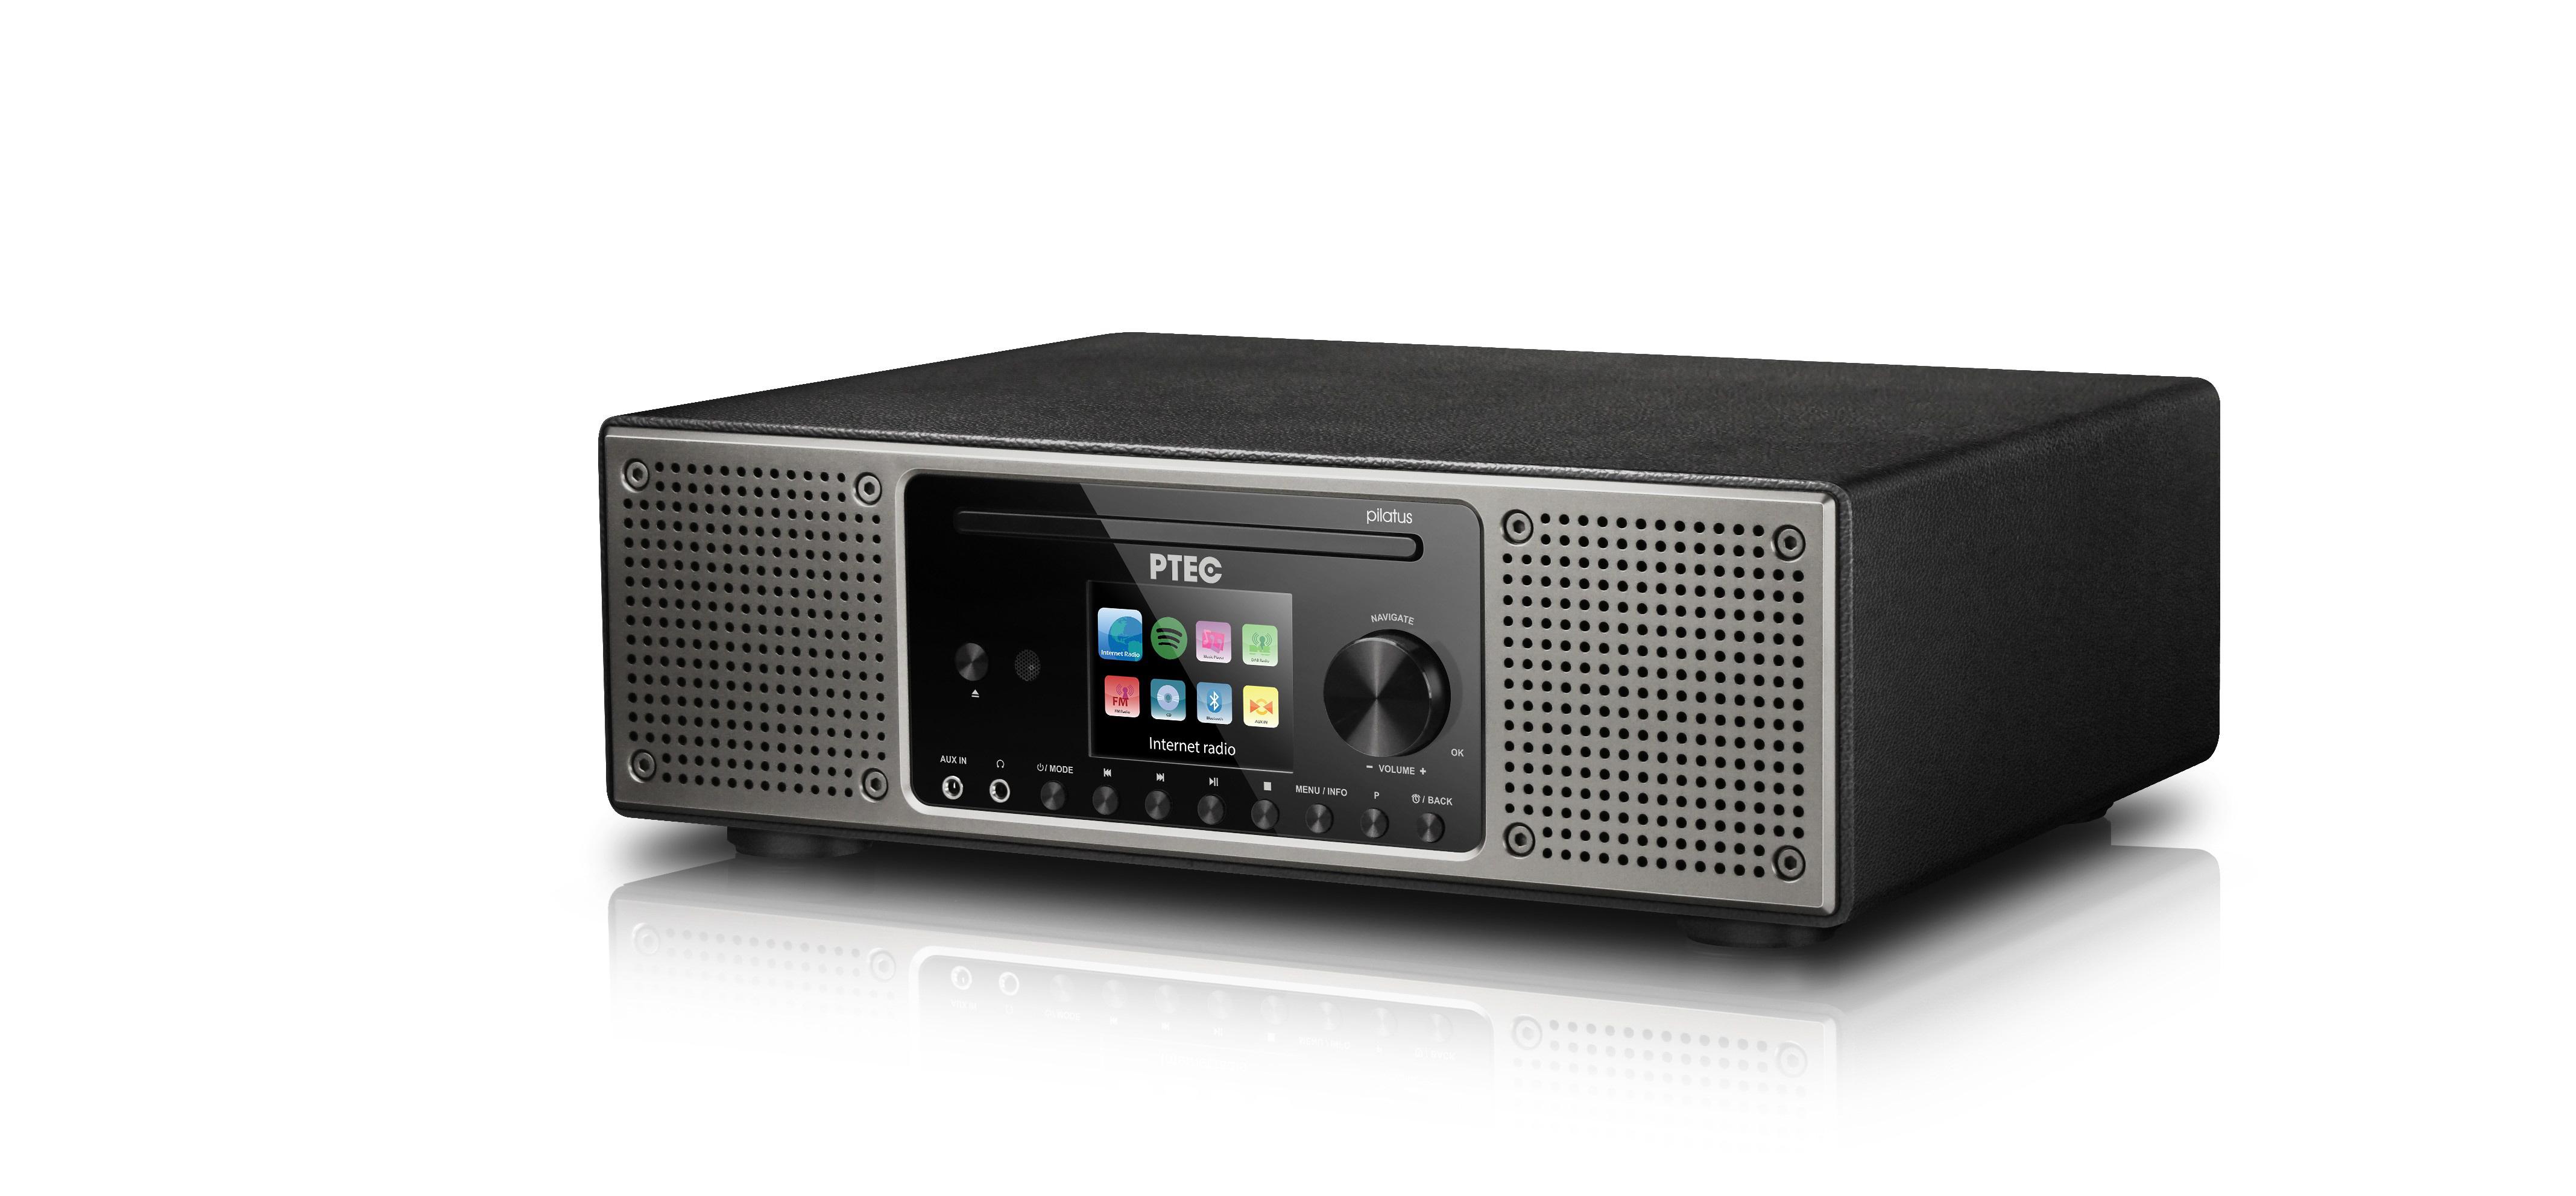 PTEC Pilatus II - Digital radio